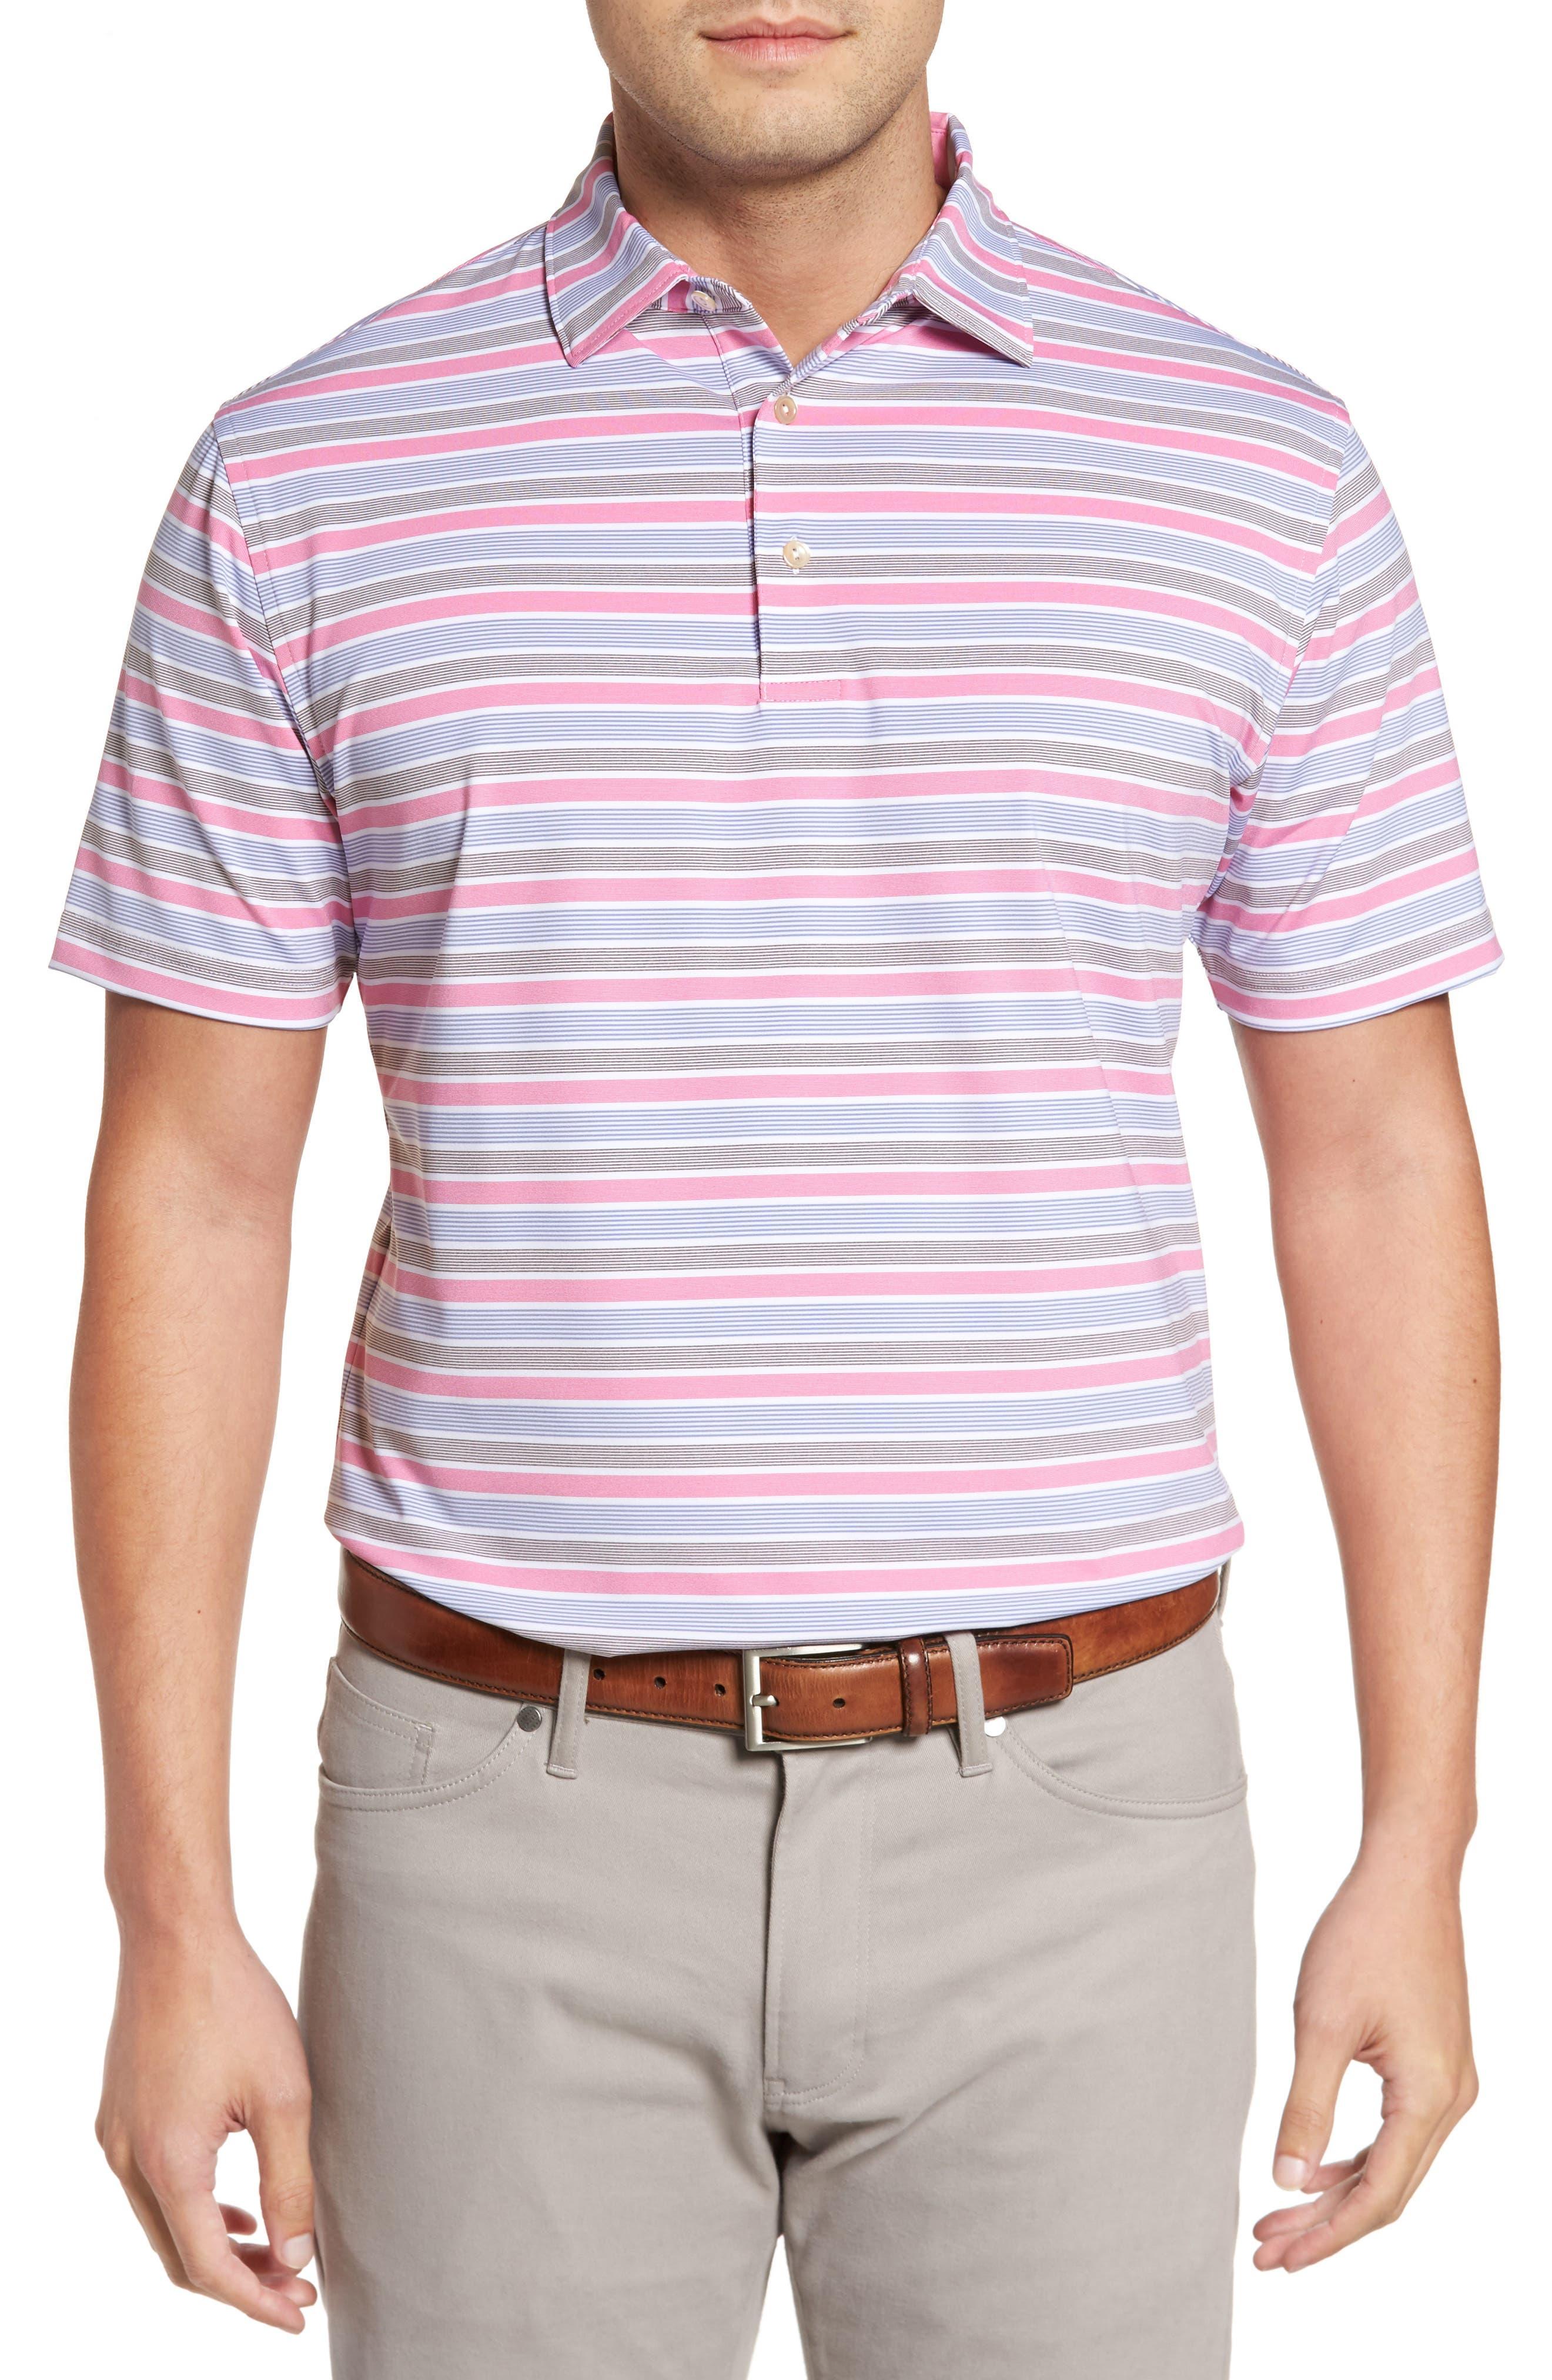 Blount Stripe Stretch Jersey Polo,                         Main,                         color, White/ Thunderbird